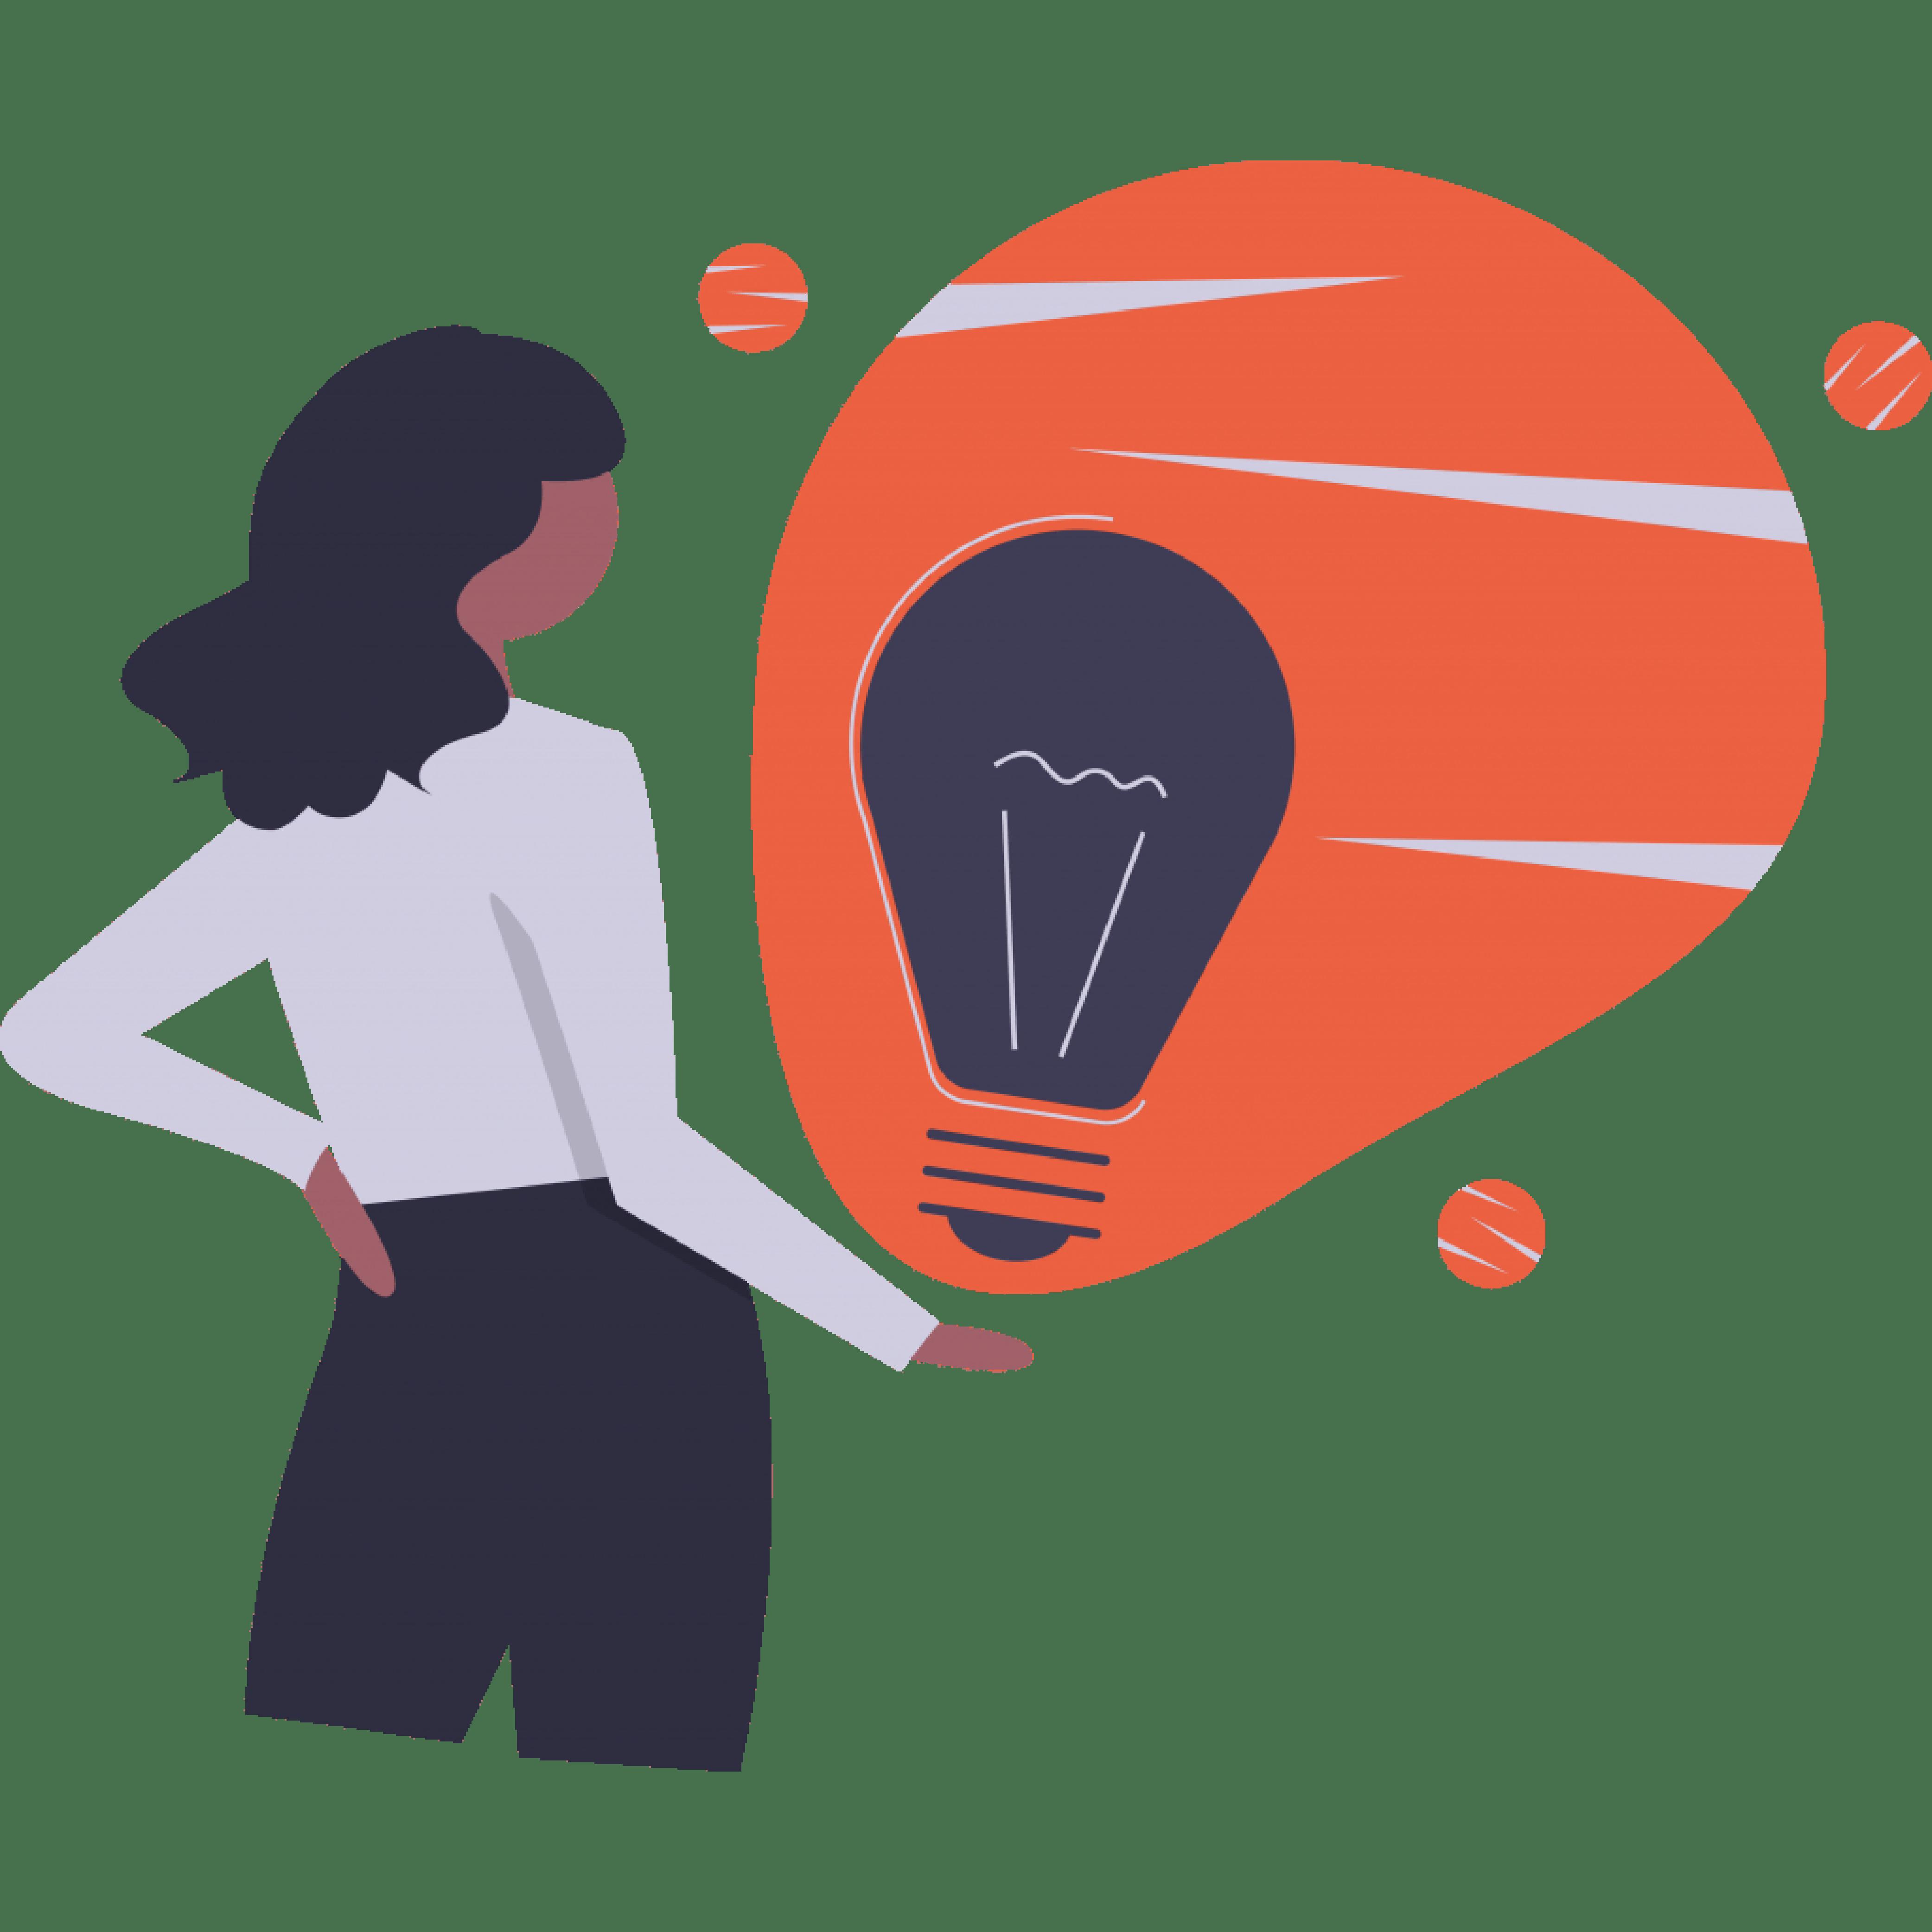 conseil innovation lyon